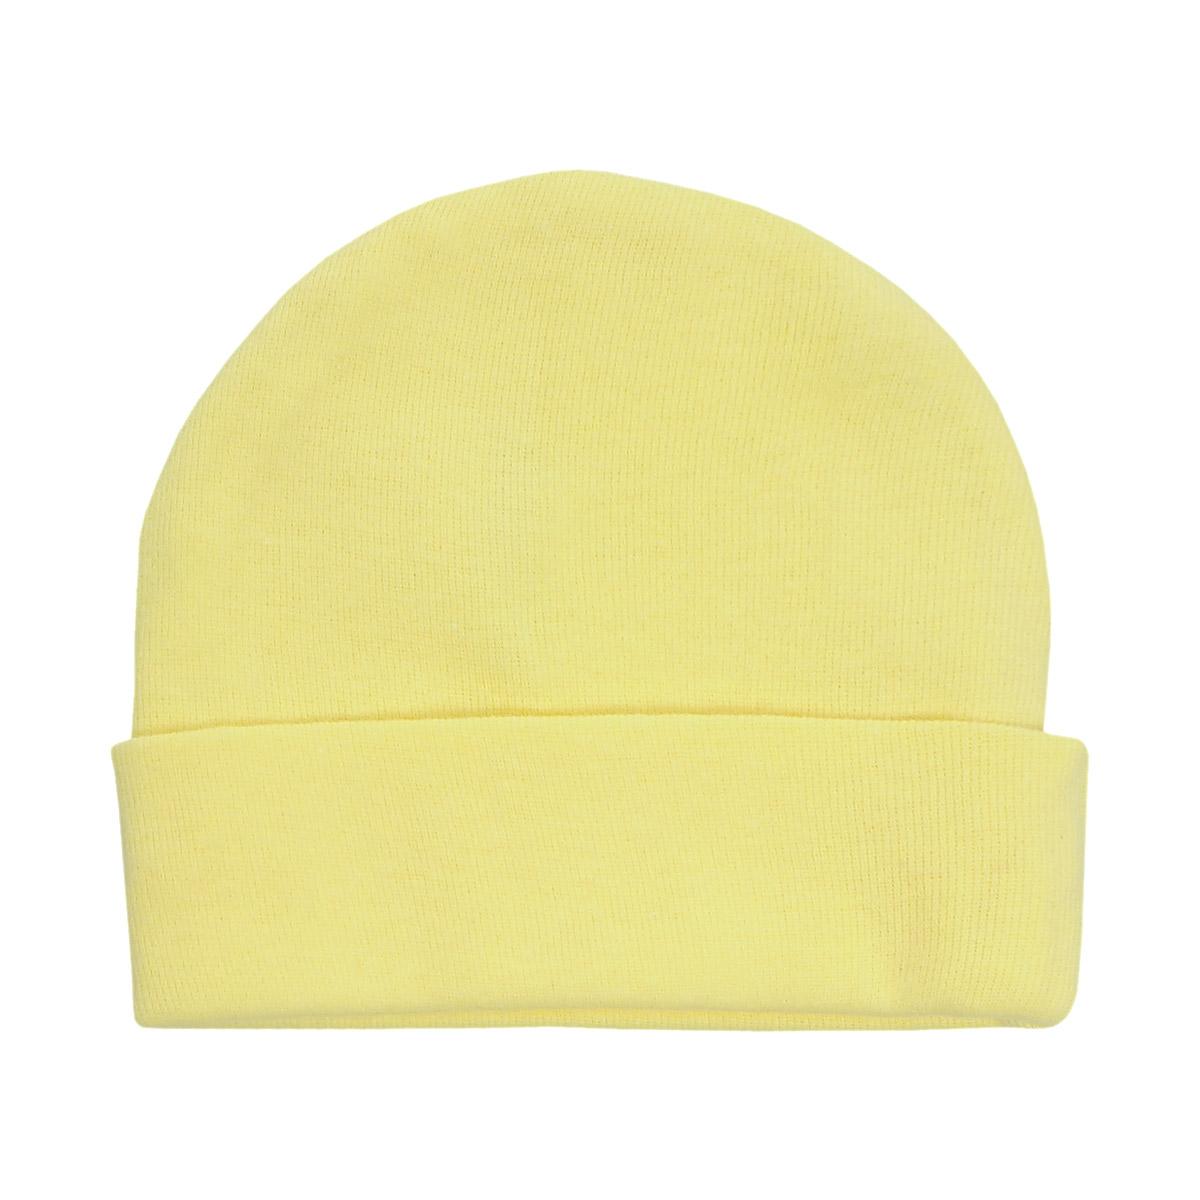 Шапочка унисекс Трон-Плюс, цвет: желтый. 6312. Размер 56, 1 месяц